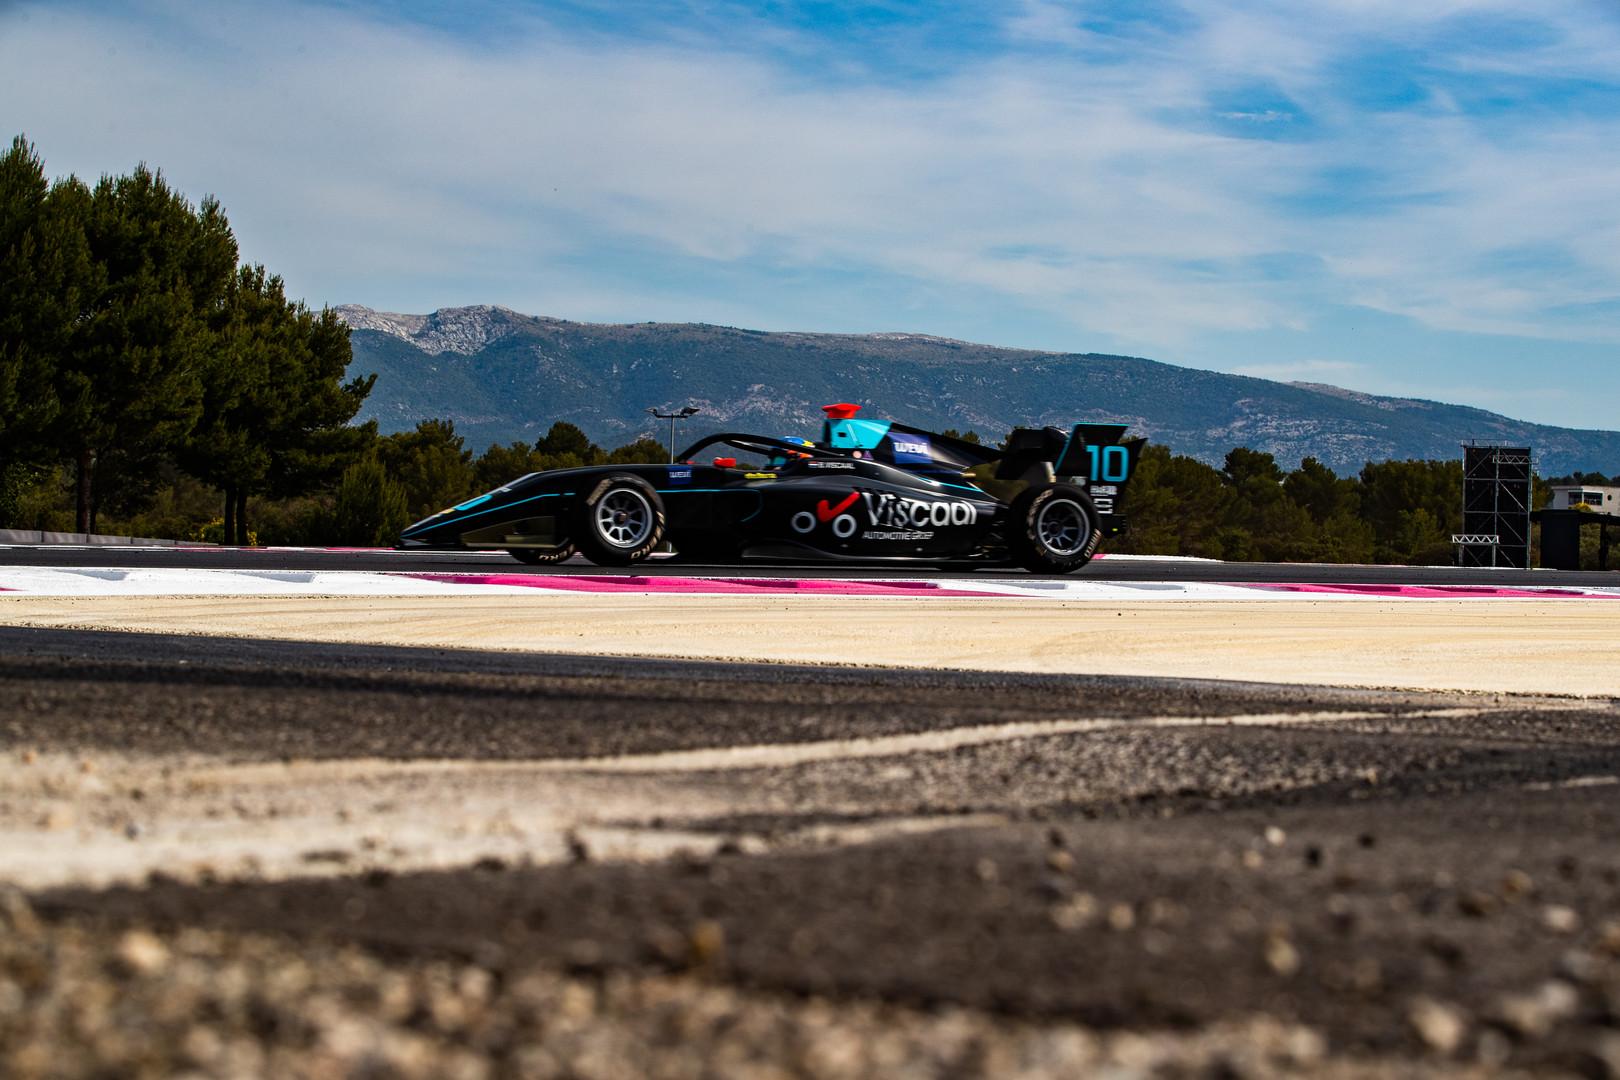 Bent F3 Paul Ricard 23-06-2019-8.jpg